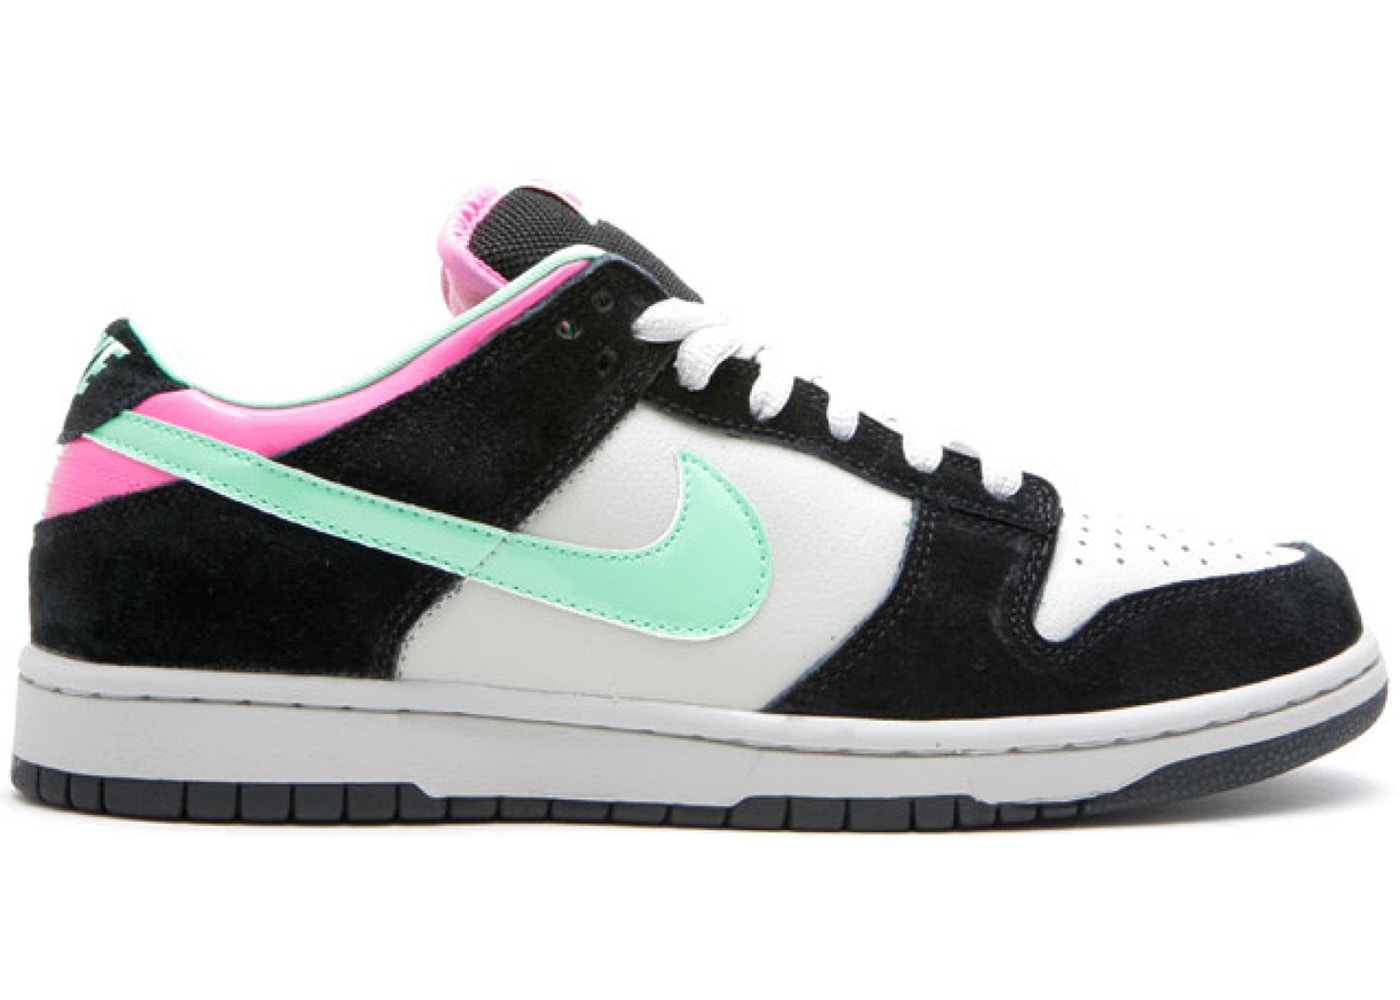 501b19cc Nike SB Dunk Low Magnet Light Poison Green - 304292-033